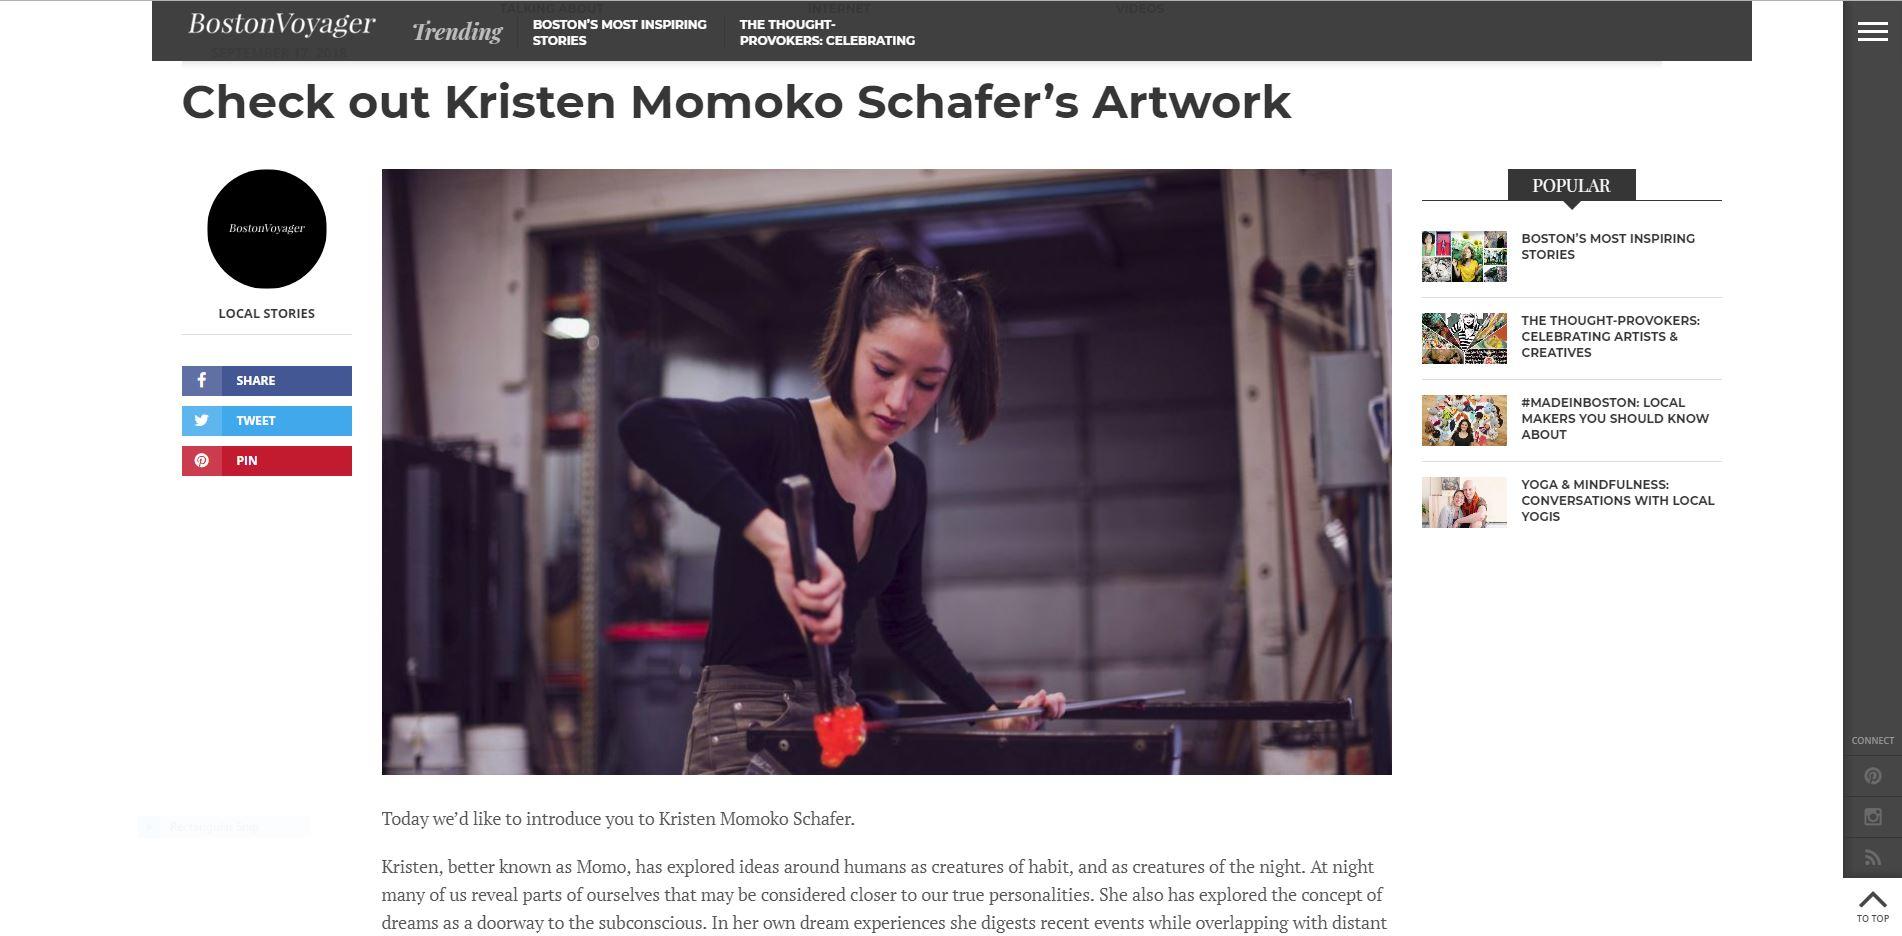 Boston Voyager   Sept 17th 2018 - Check out Kristen Momoko Schafer's Artwork